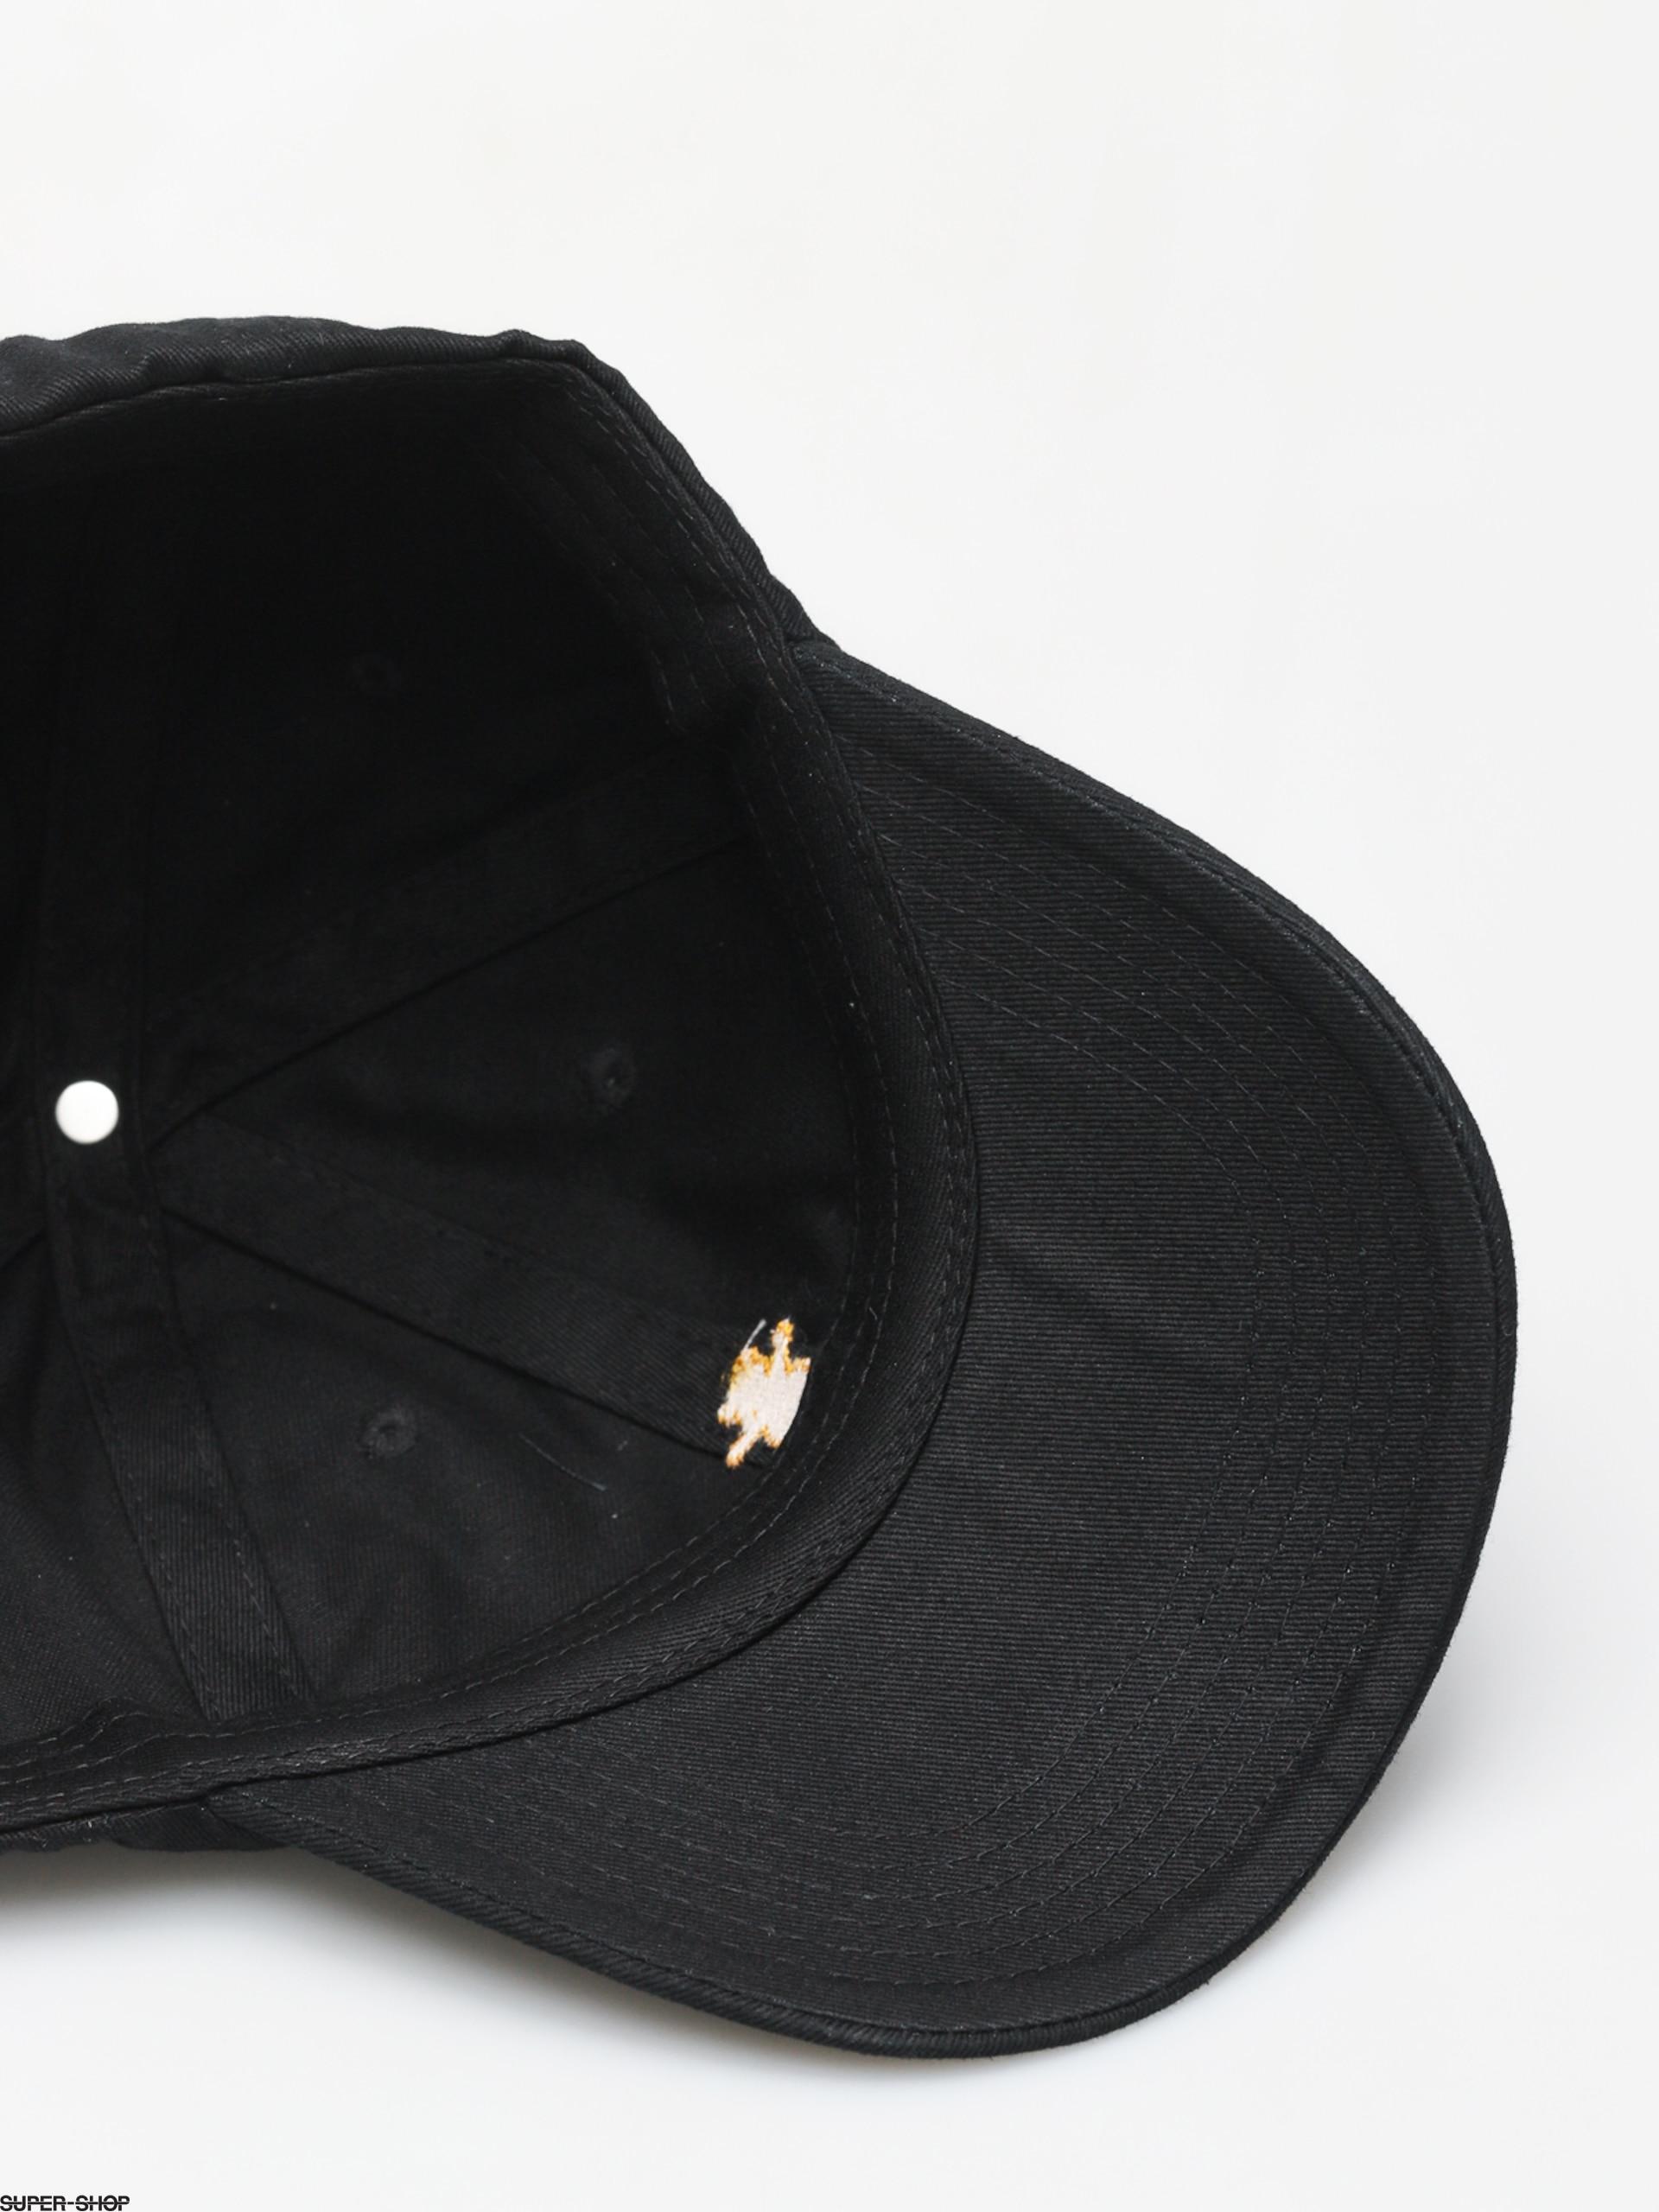 Grizzly Griptape Og Dad Bear ZD Cap (black) 1e1901a5e855